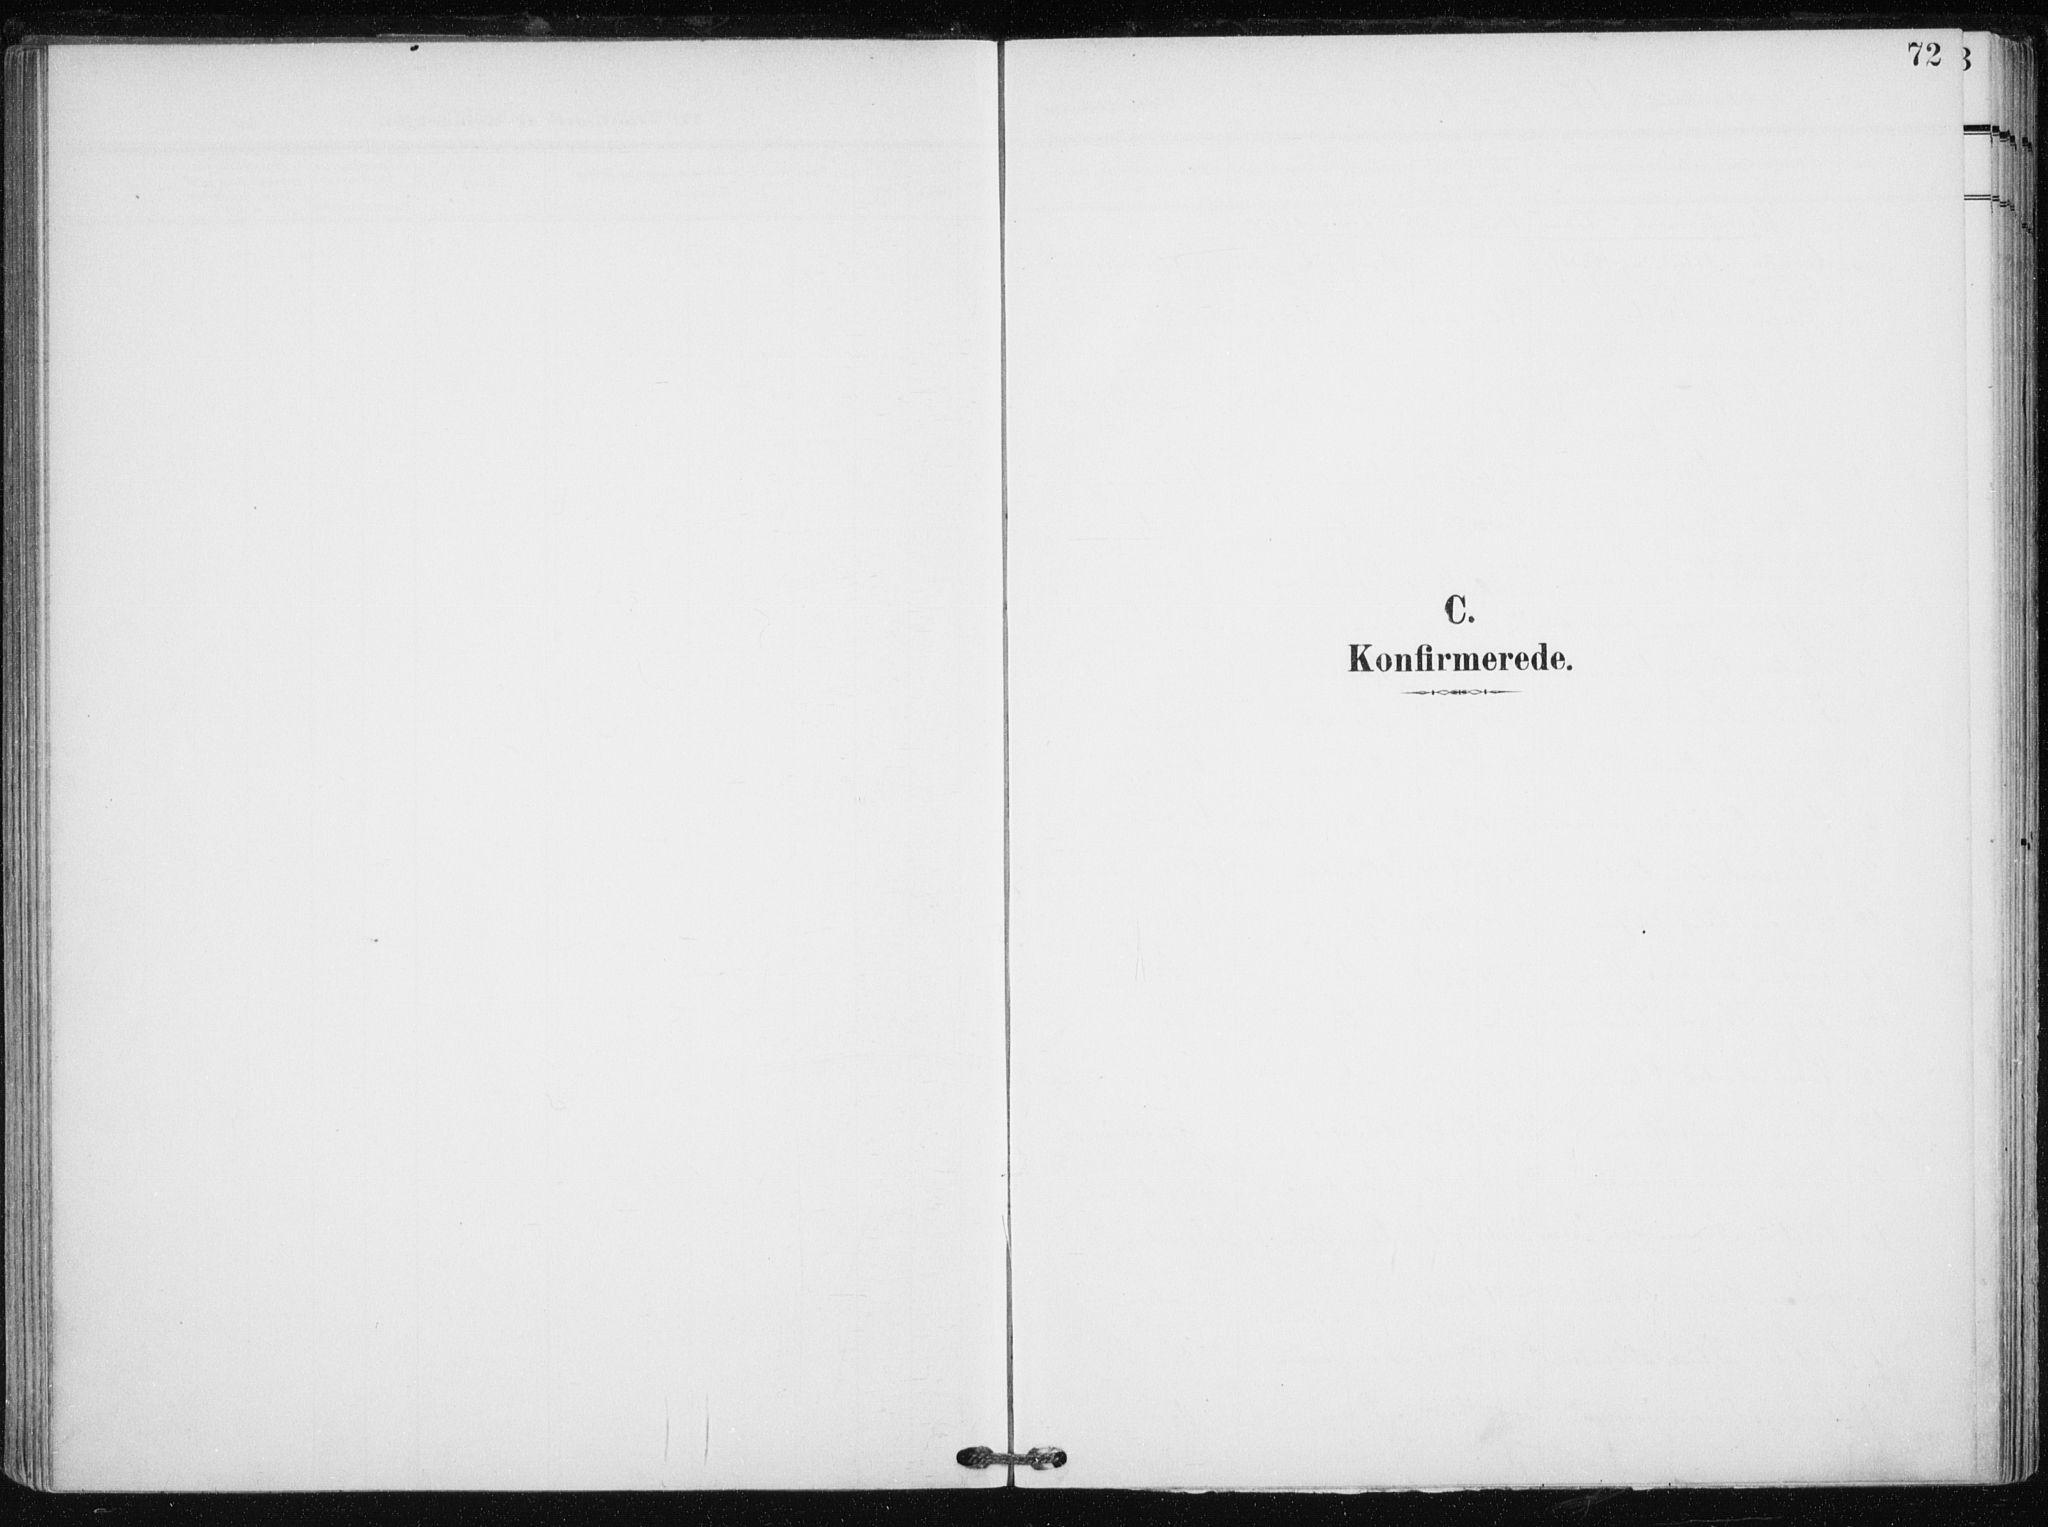 SATØ, Tranøy sokneprestkontor, I/Ia/Iaa/L0012kirke: Ministerialbok nr. 12, 1905-1918, s. 72